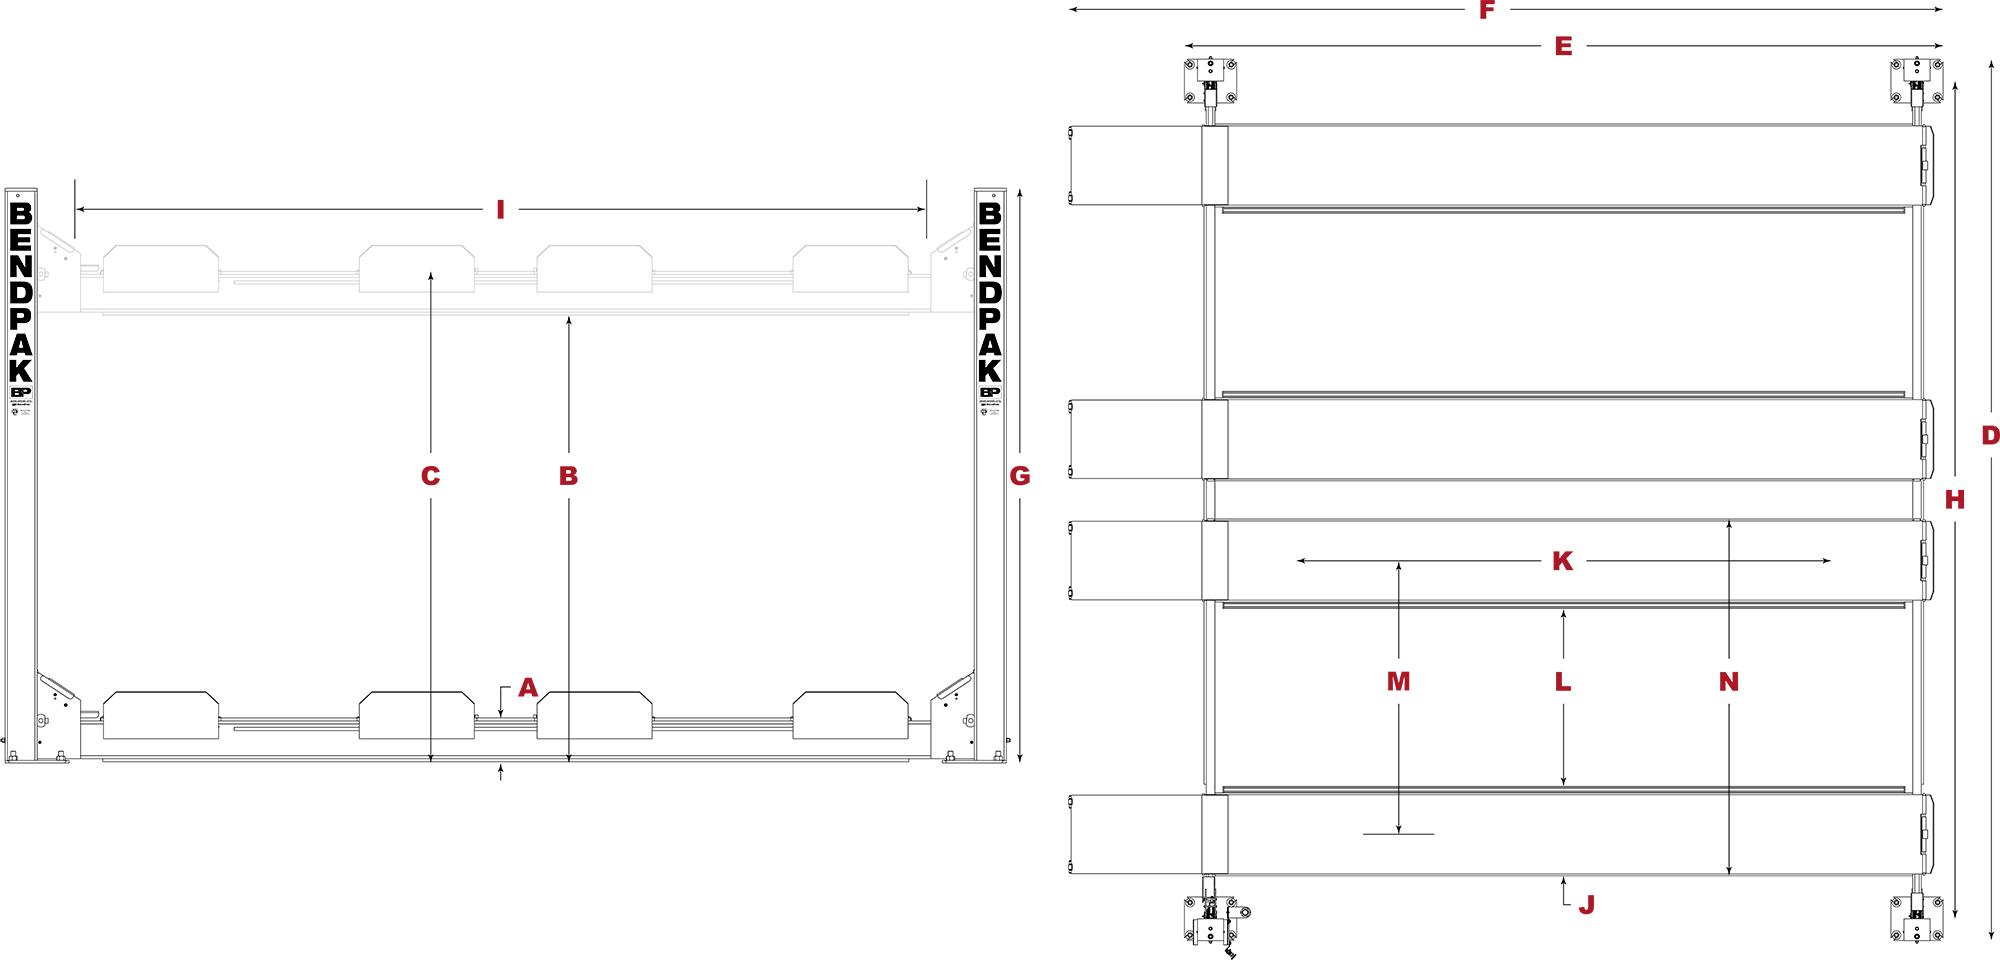 Hd-9sw Four-post Hoist - Super-wide Car Lift